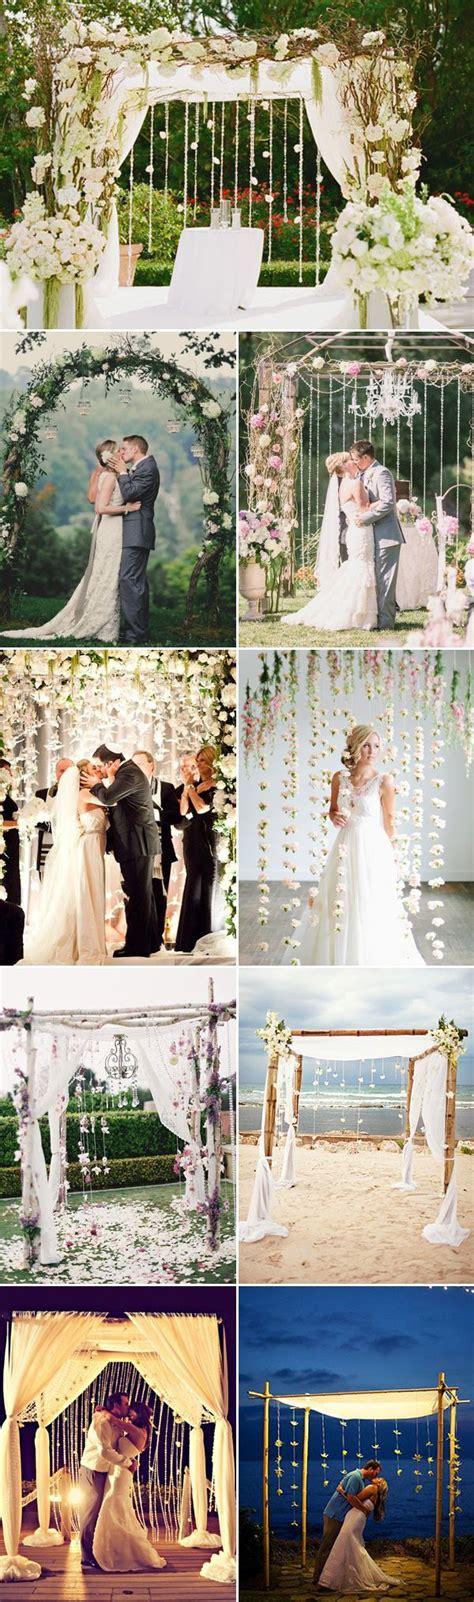 s2 desain indonesia 50 beautiful wedding arch decoration ideas wedding